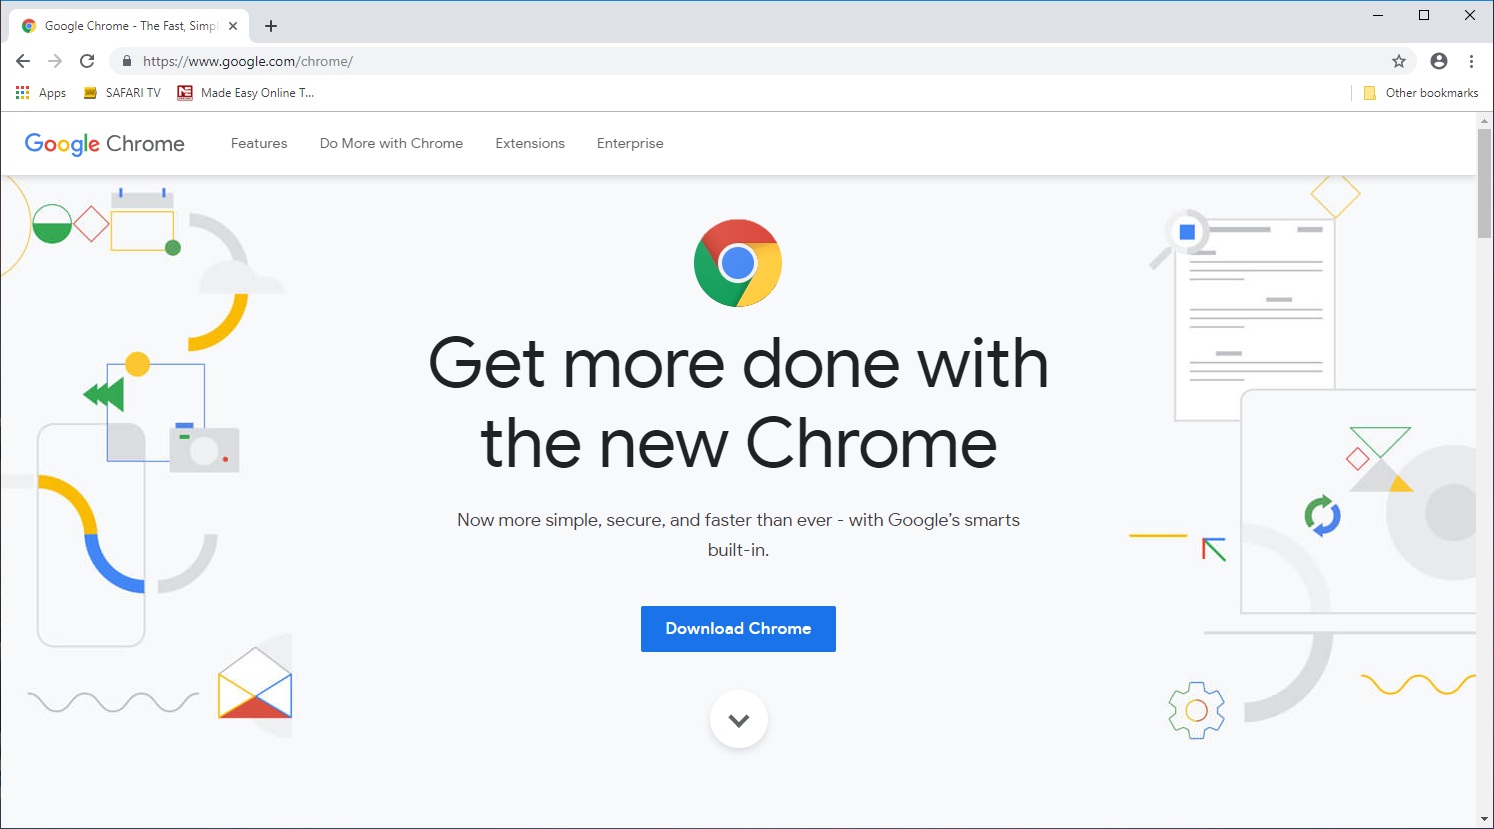 Google Chrome 48 0 Download (Free) - chrome exe